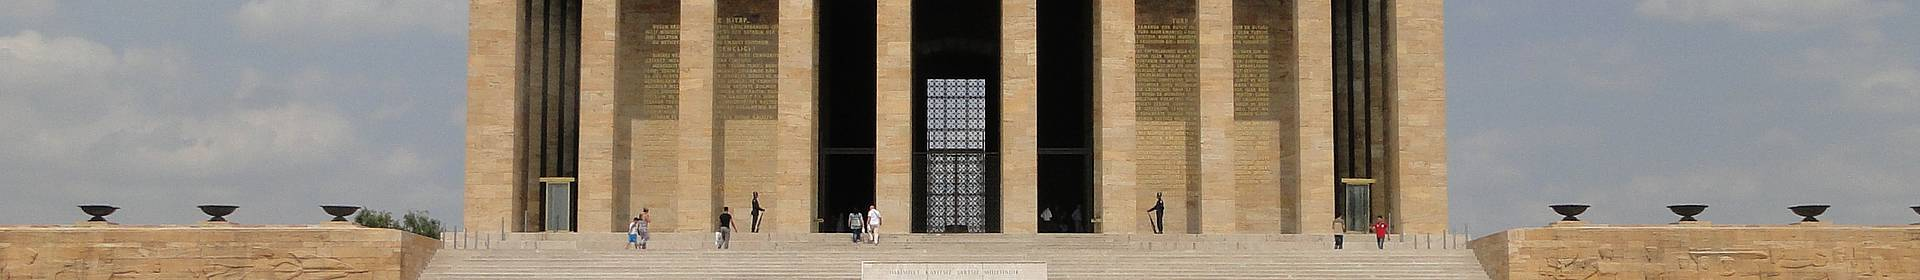 mausolée d'Ataturk